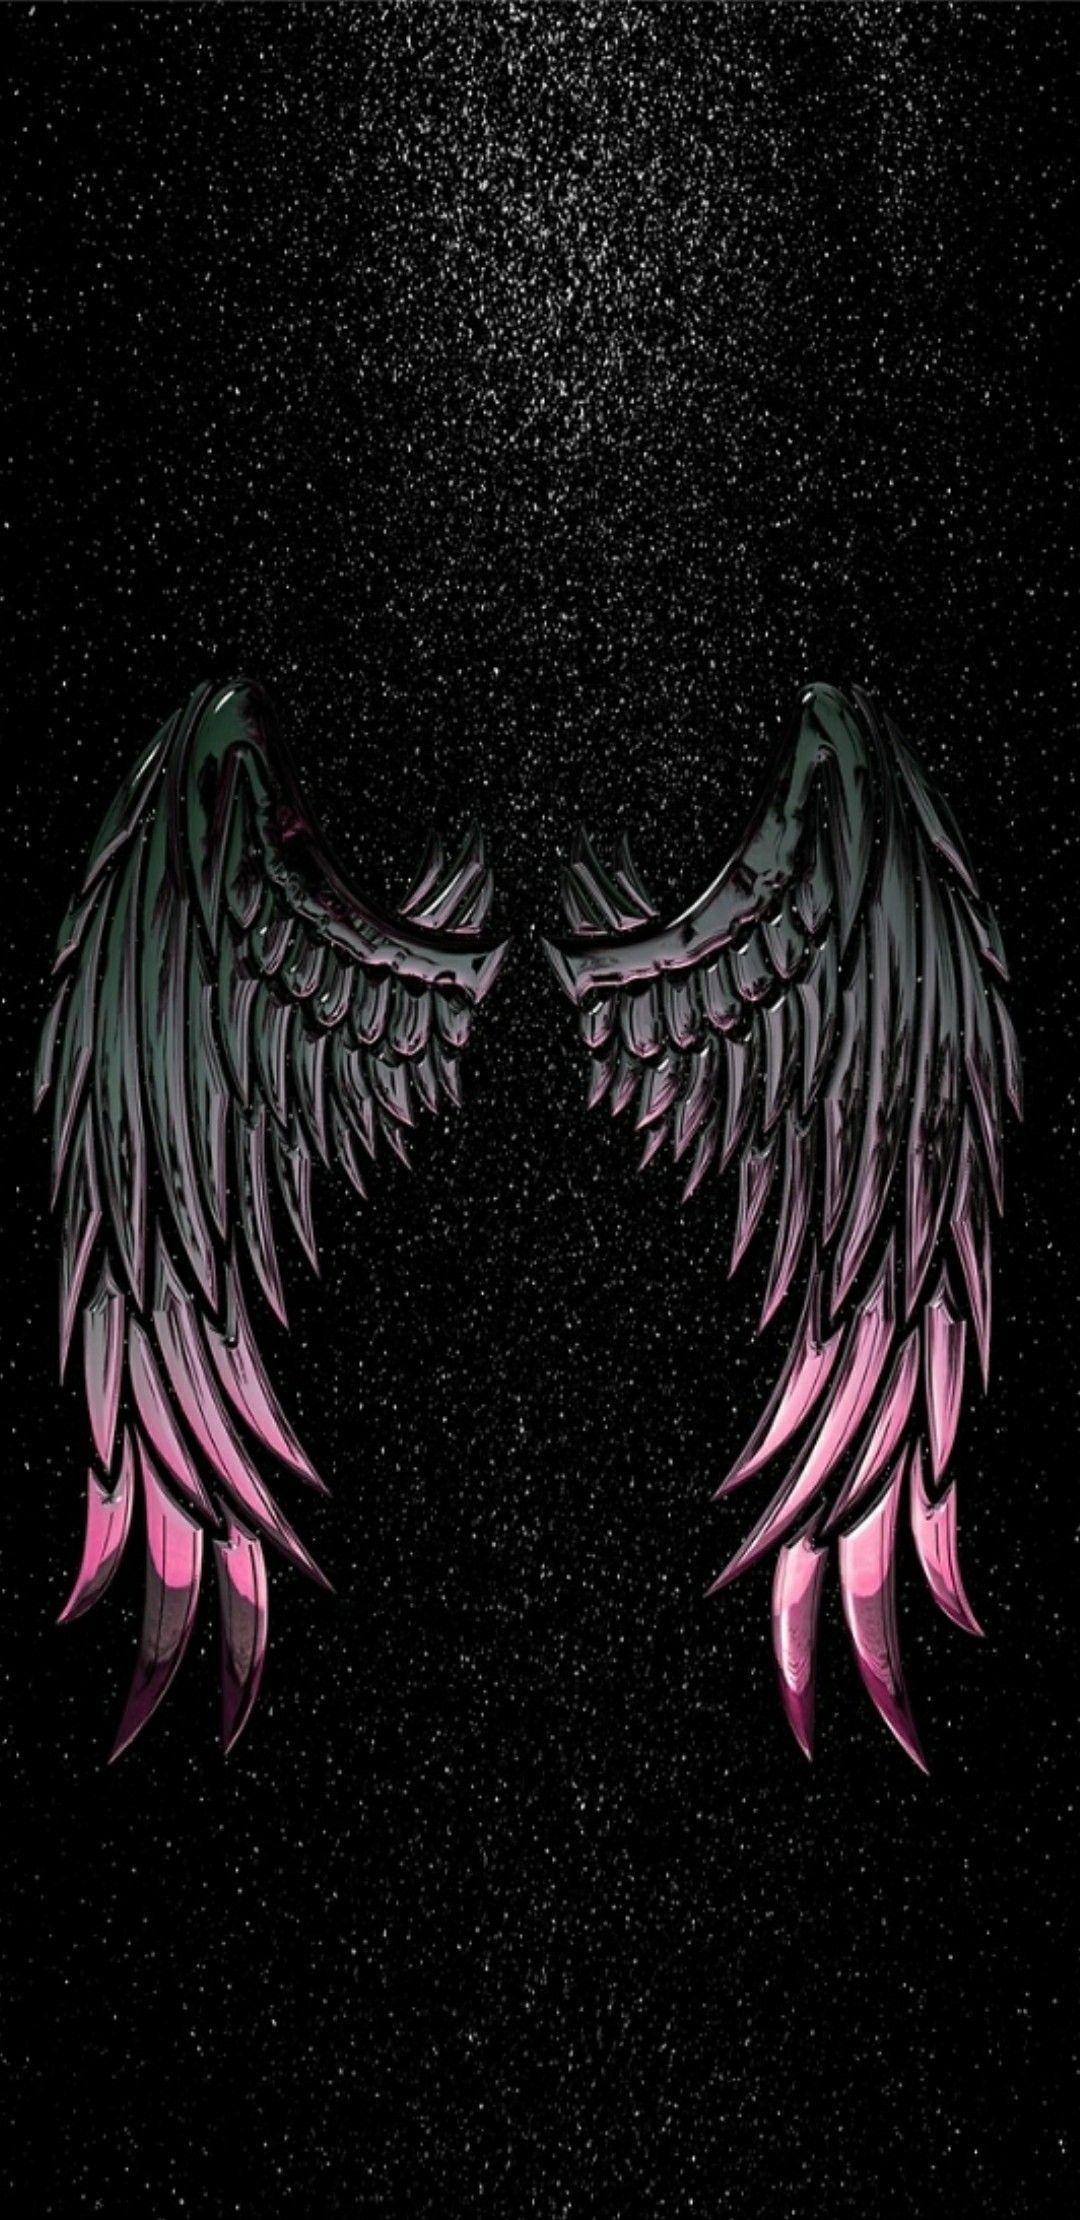 Angel Wallpaper For Iphone 7 Wings Wallpaper Angel Wallpaper Angel Wings Art Aesthetic iphone angel wings wallpaper